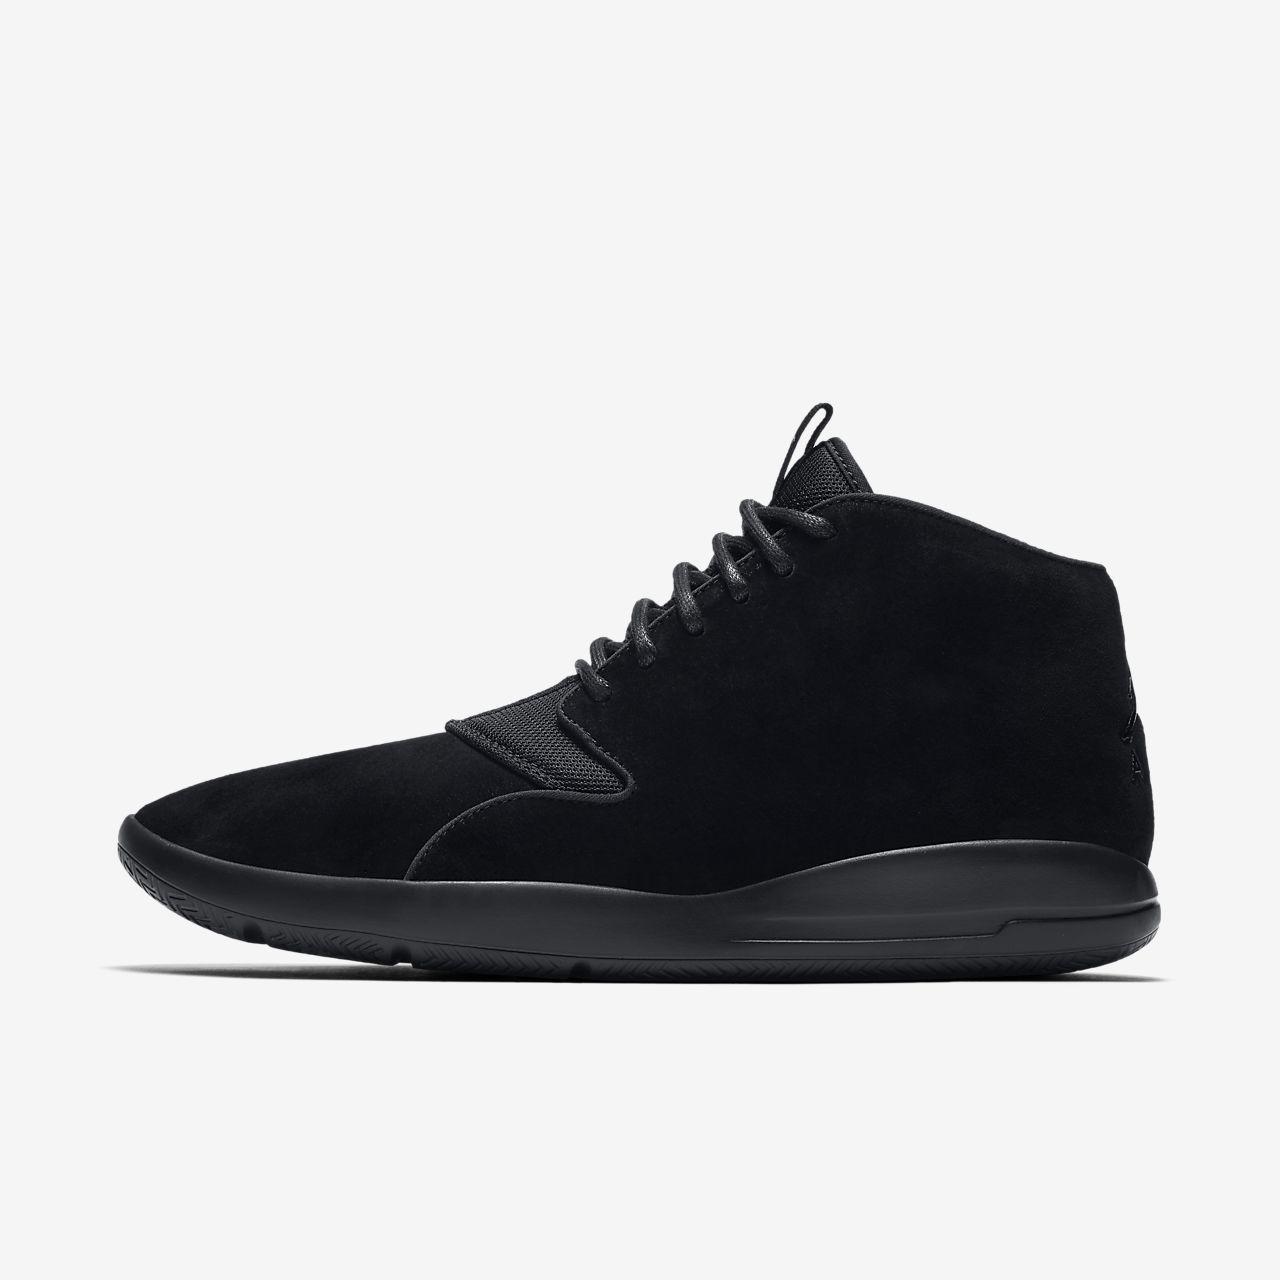 buy online 00d6d 06bbd ... canada jordan eclipse chukka mens shoe 432d4 ae3af